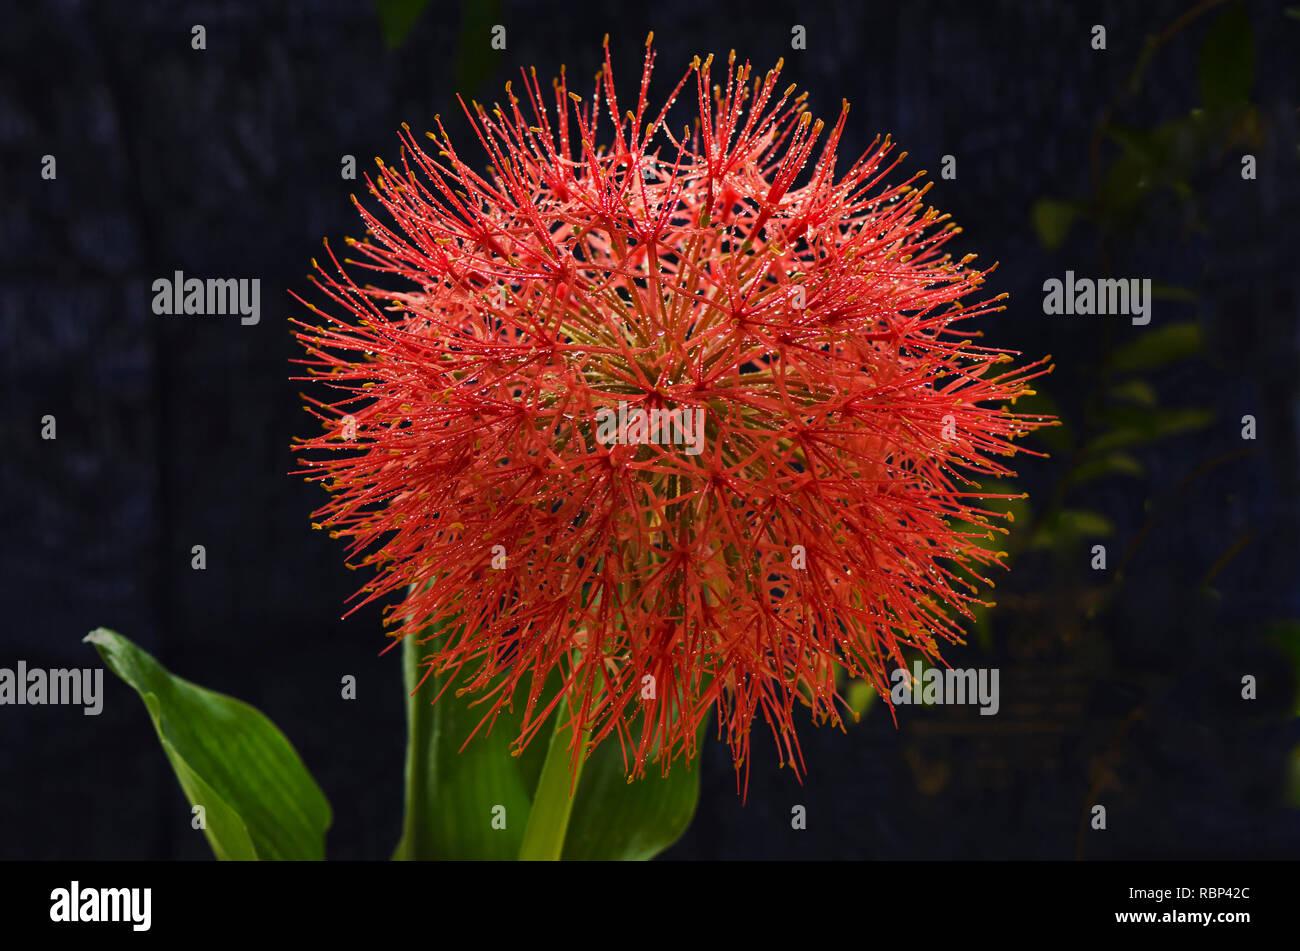 football lily flower, Mumbai, Maharashtra, India, Asia - Stock Image